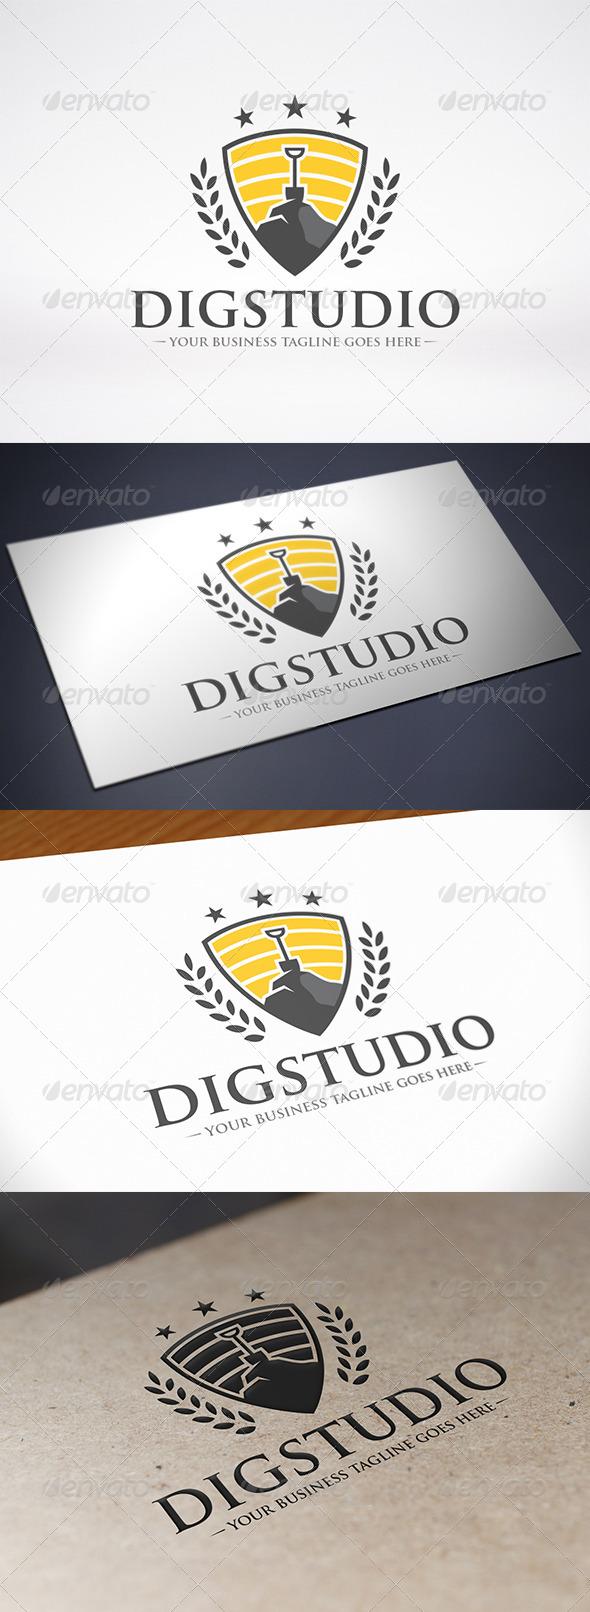 Dig Studio Logo Template